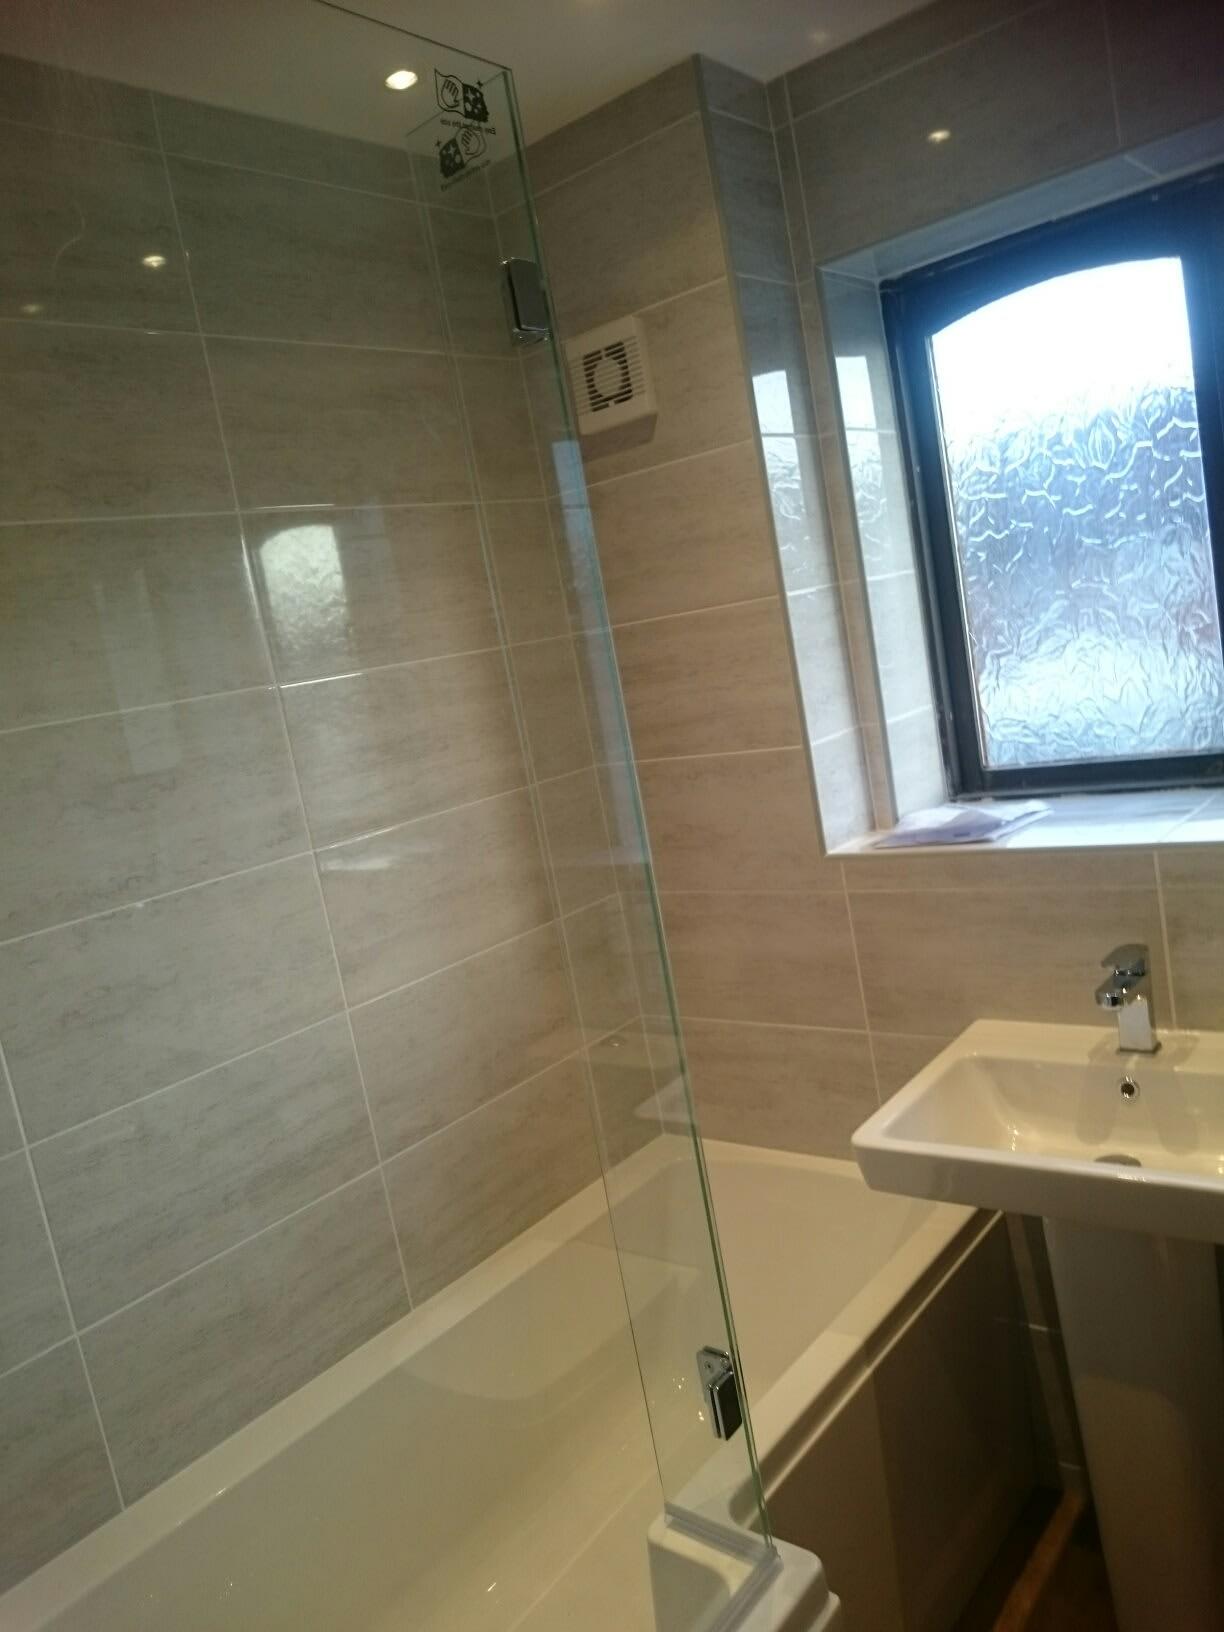 S p beattie plastering tiling full bathroom for Full bathroom installation